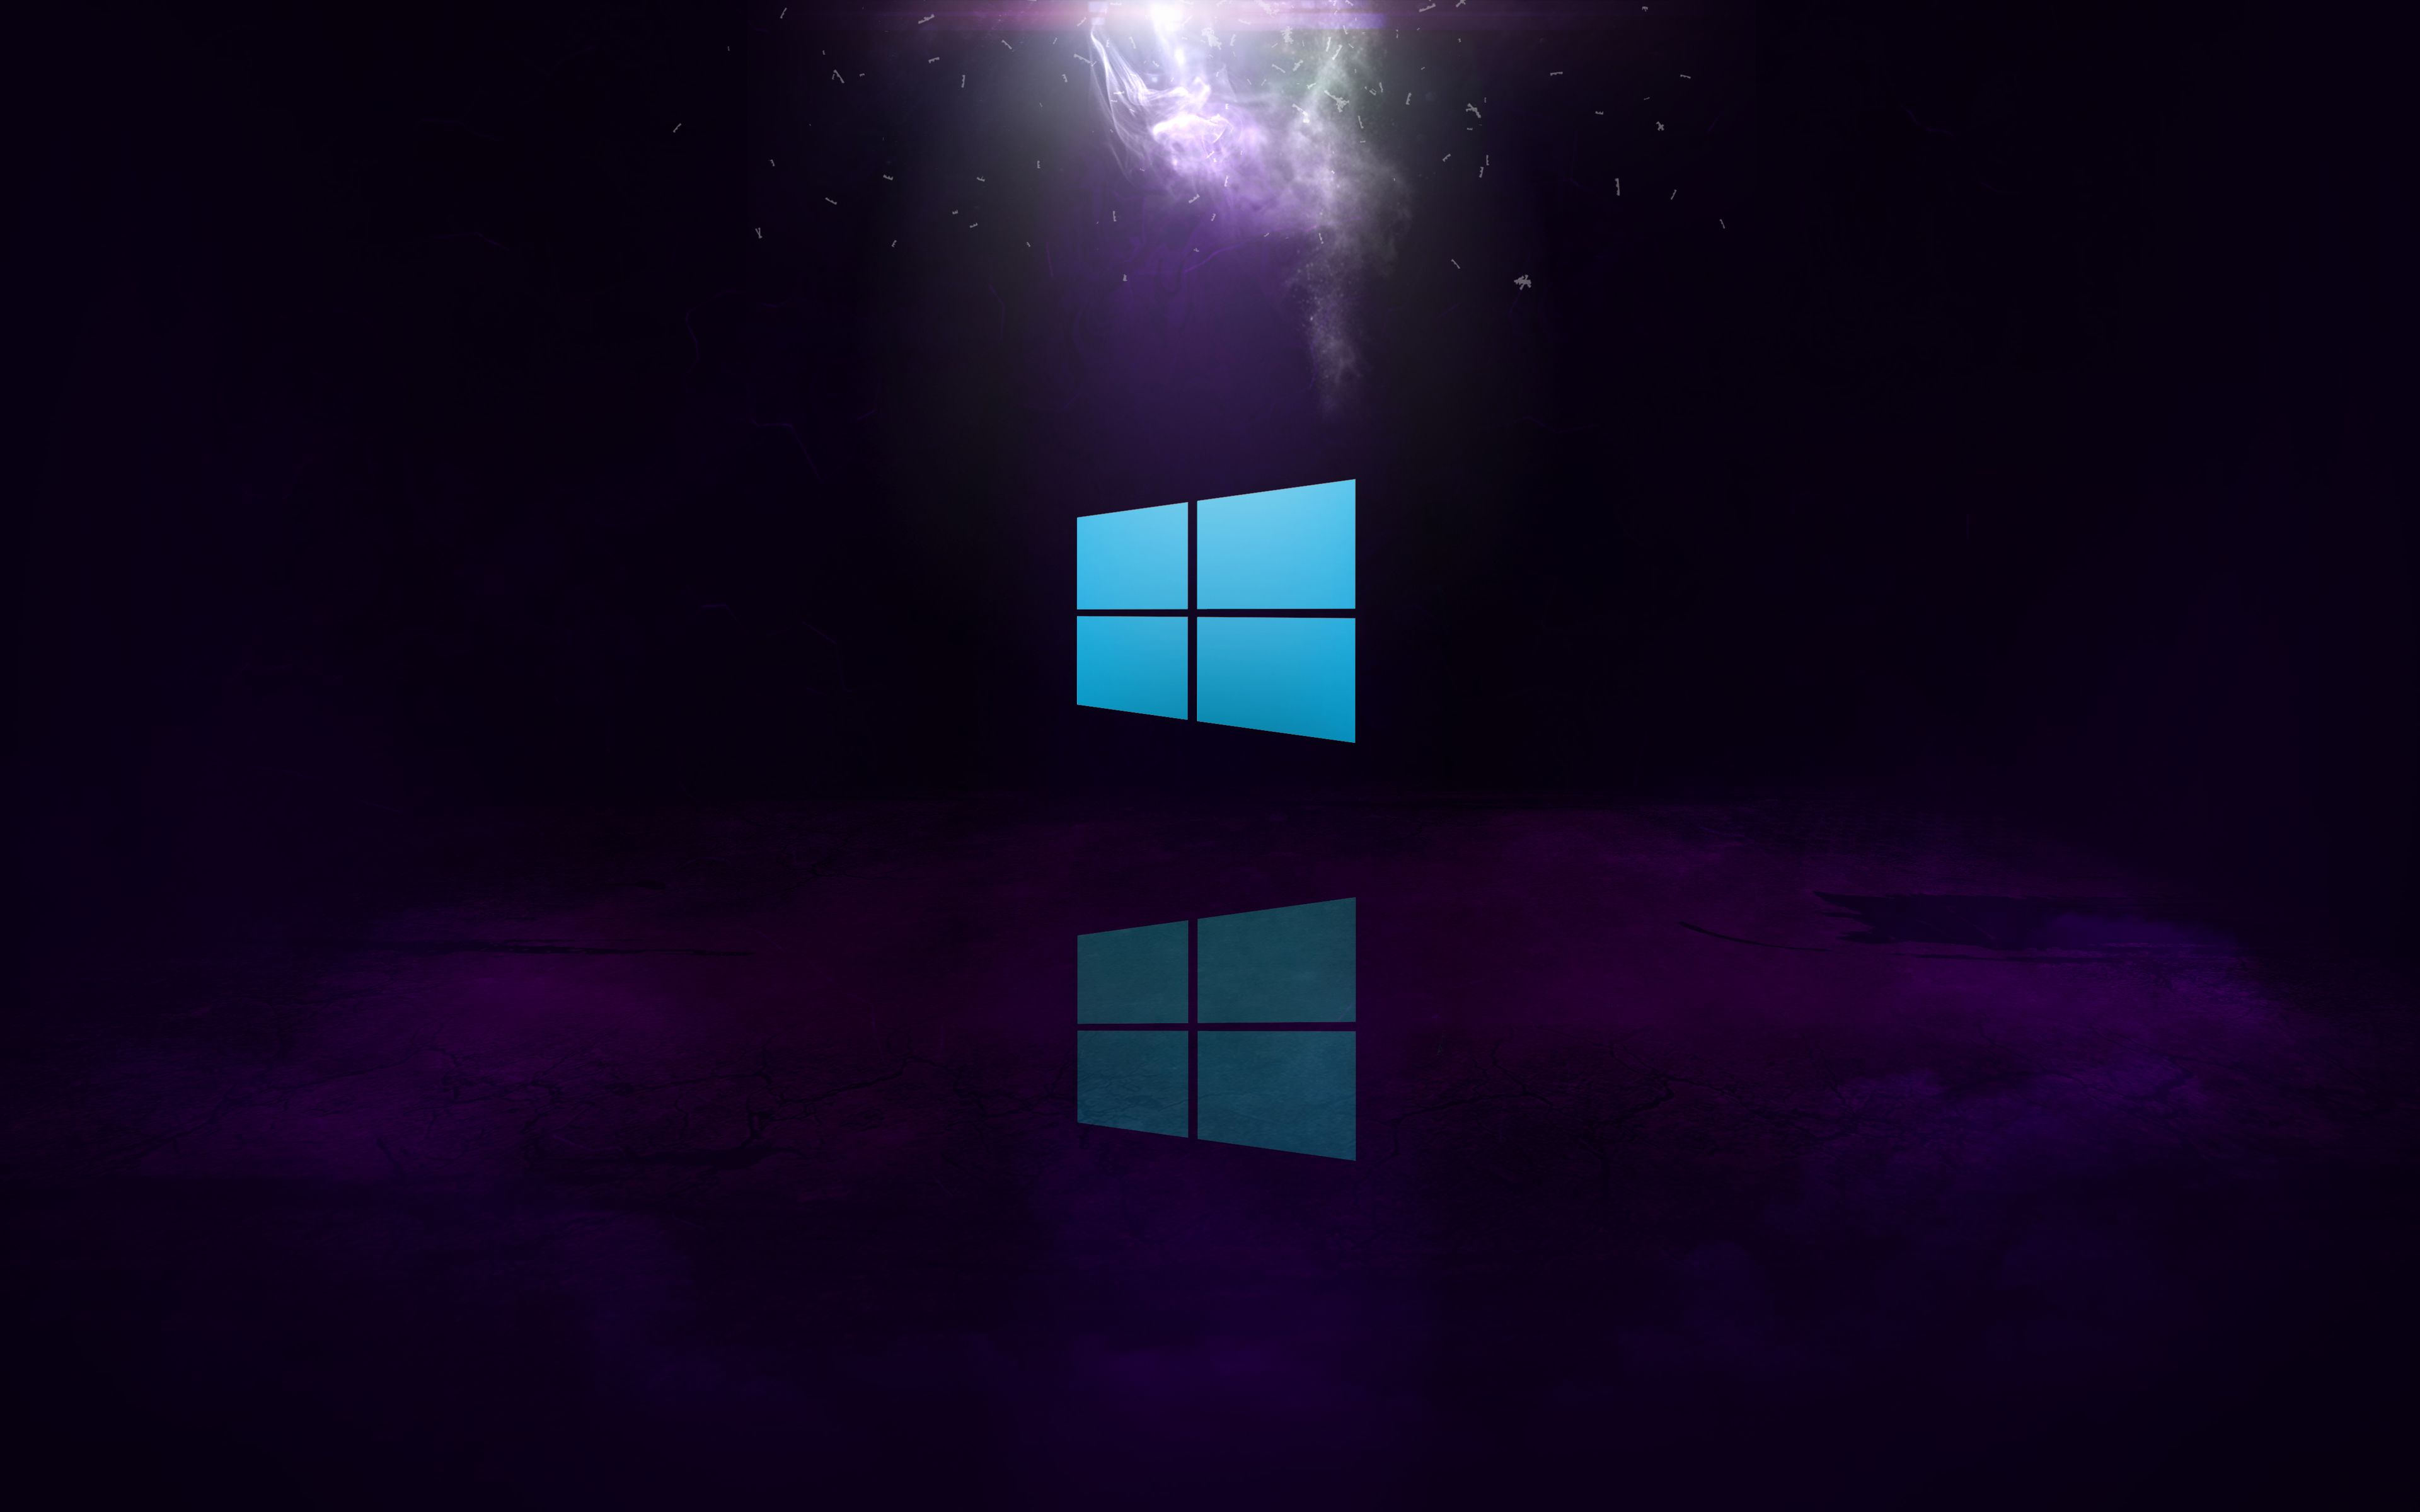 4k, Windows 10, purple background, Windows logo, Microsoft